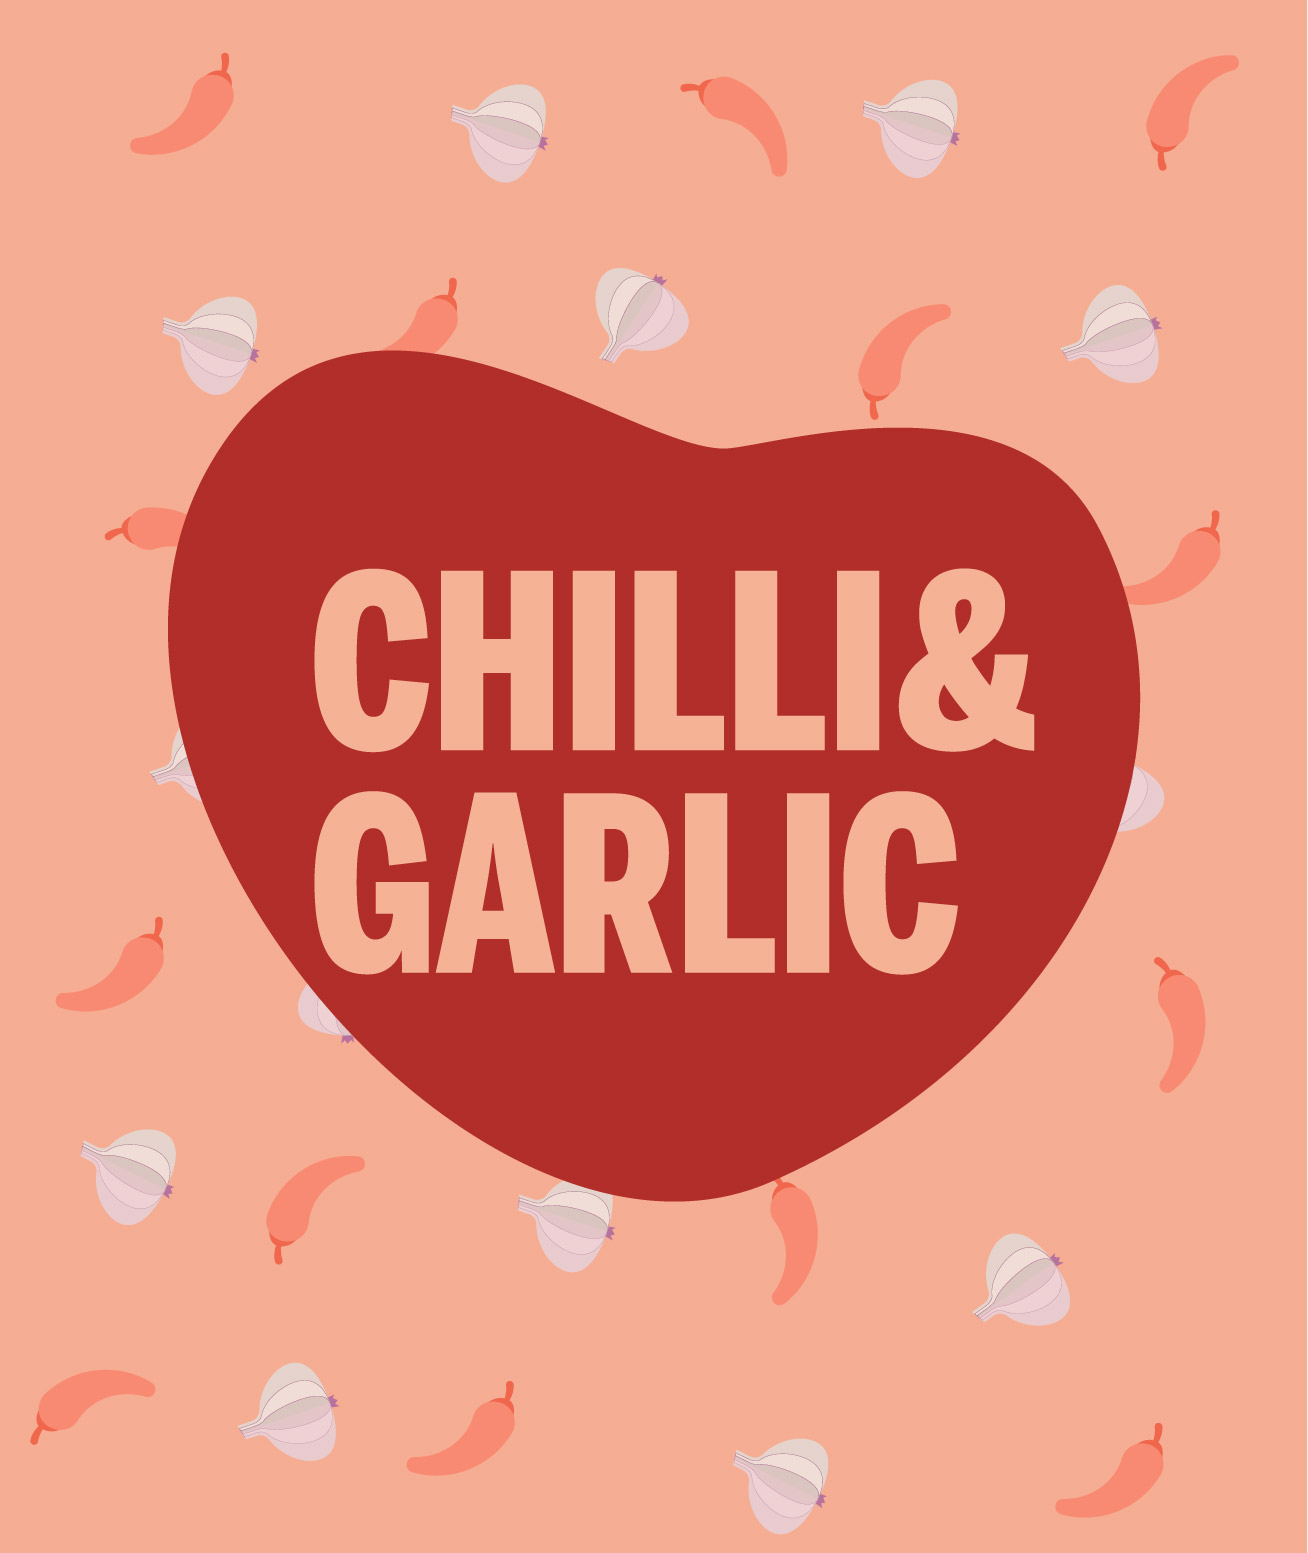 Chilli & Garlic Seitan